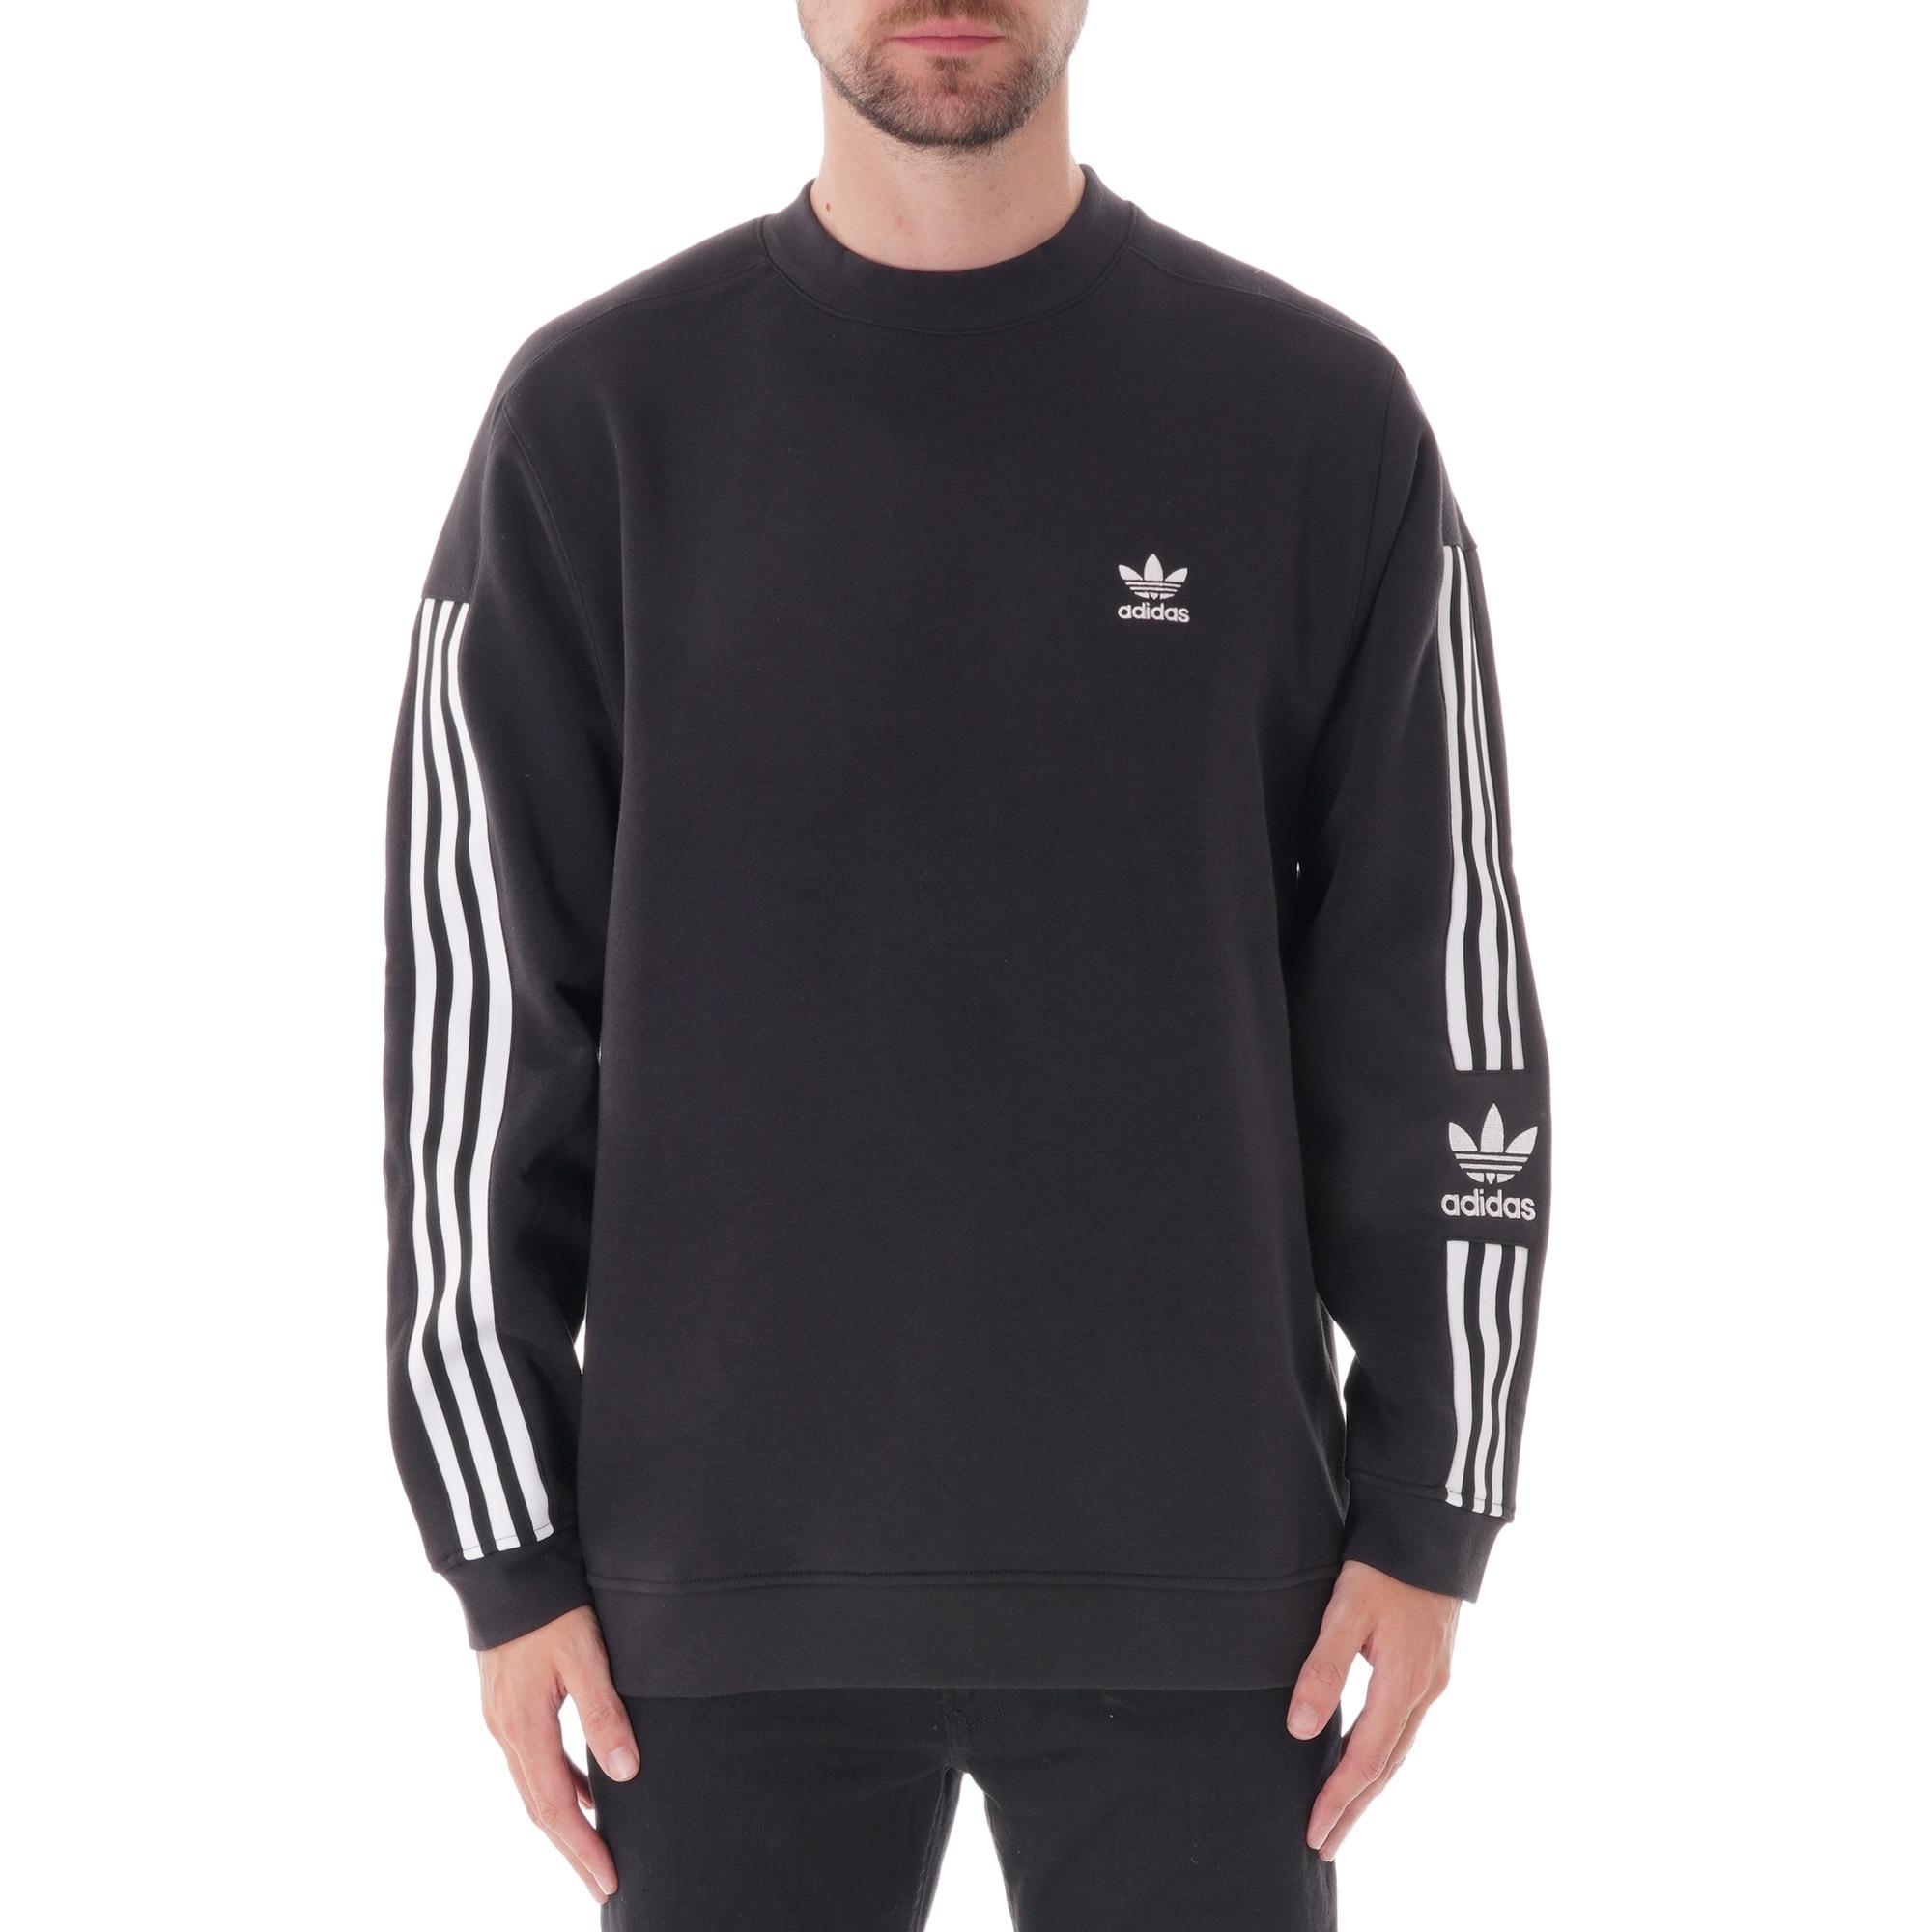 adidas Crew Sweatshirt Set Multicolor | adidas US